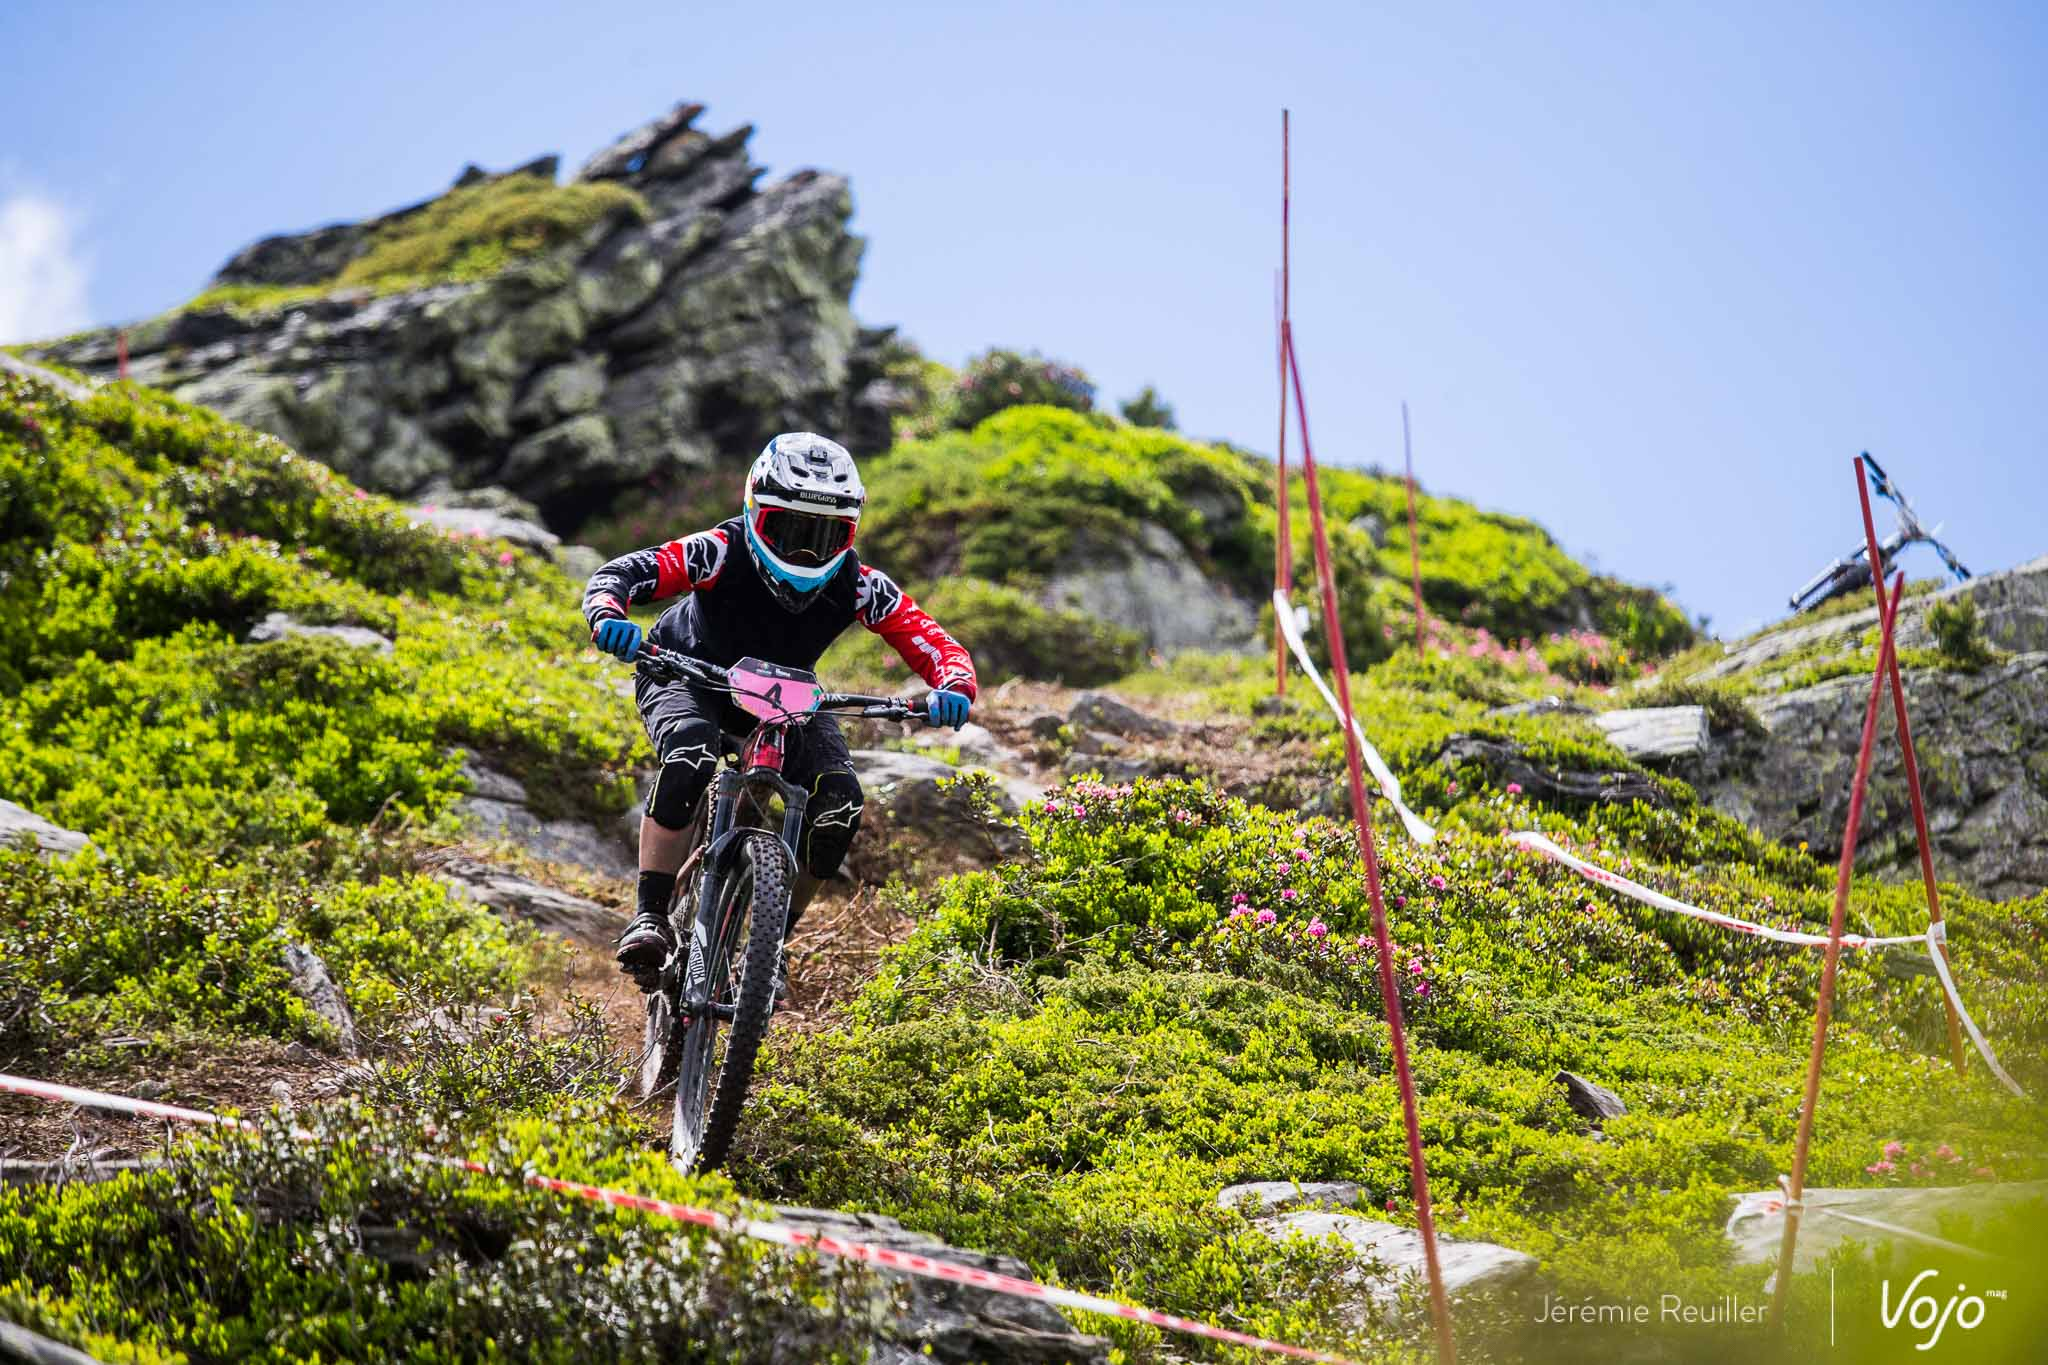 EWS_La_Thuile_raceday_1_Copyright_Reuiller_VojoMag-3